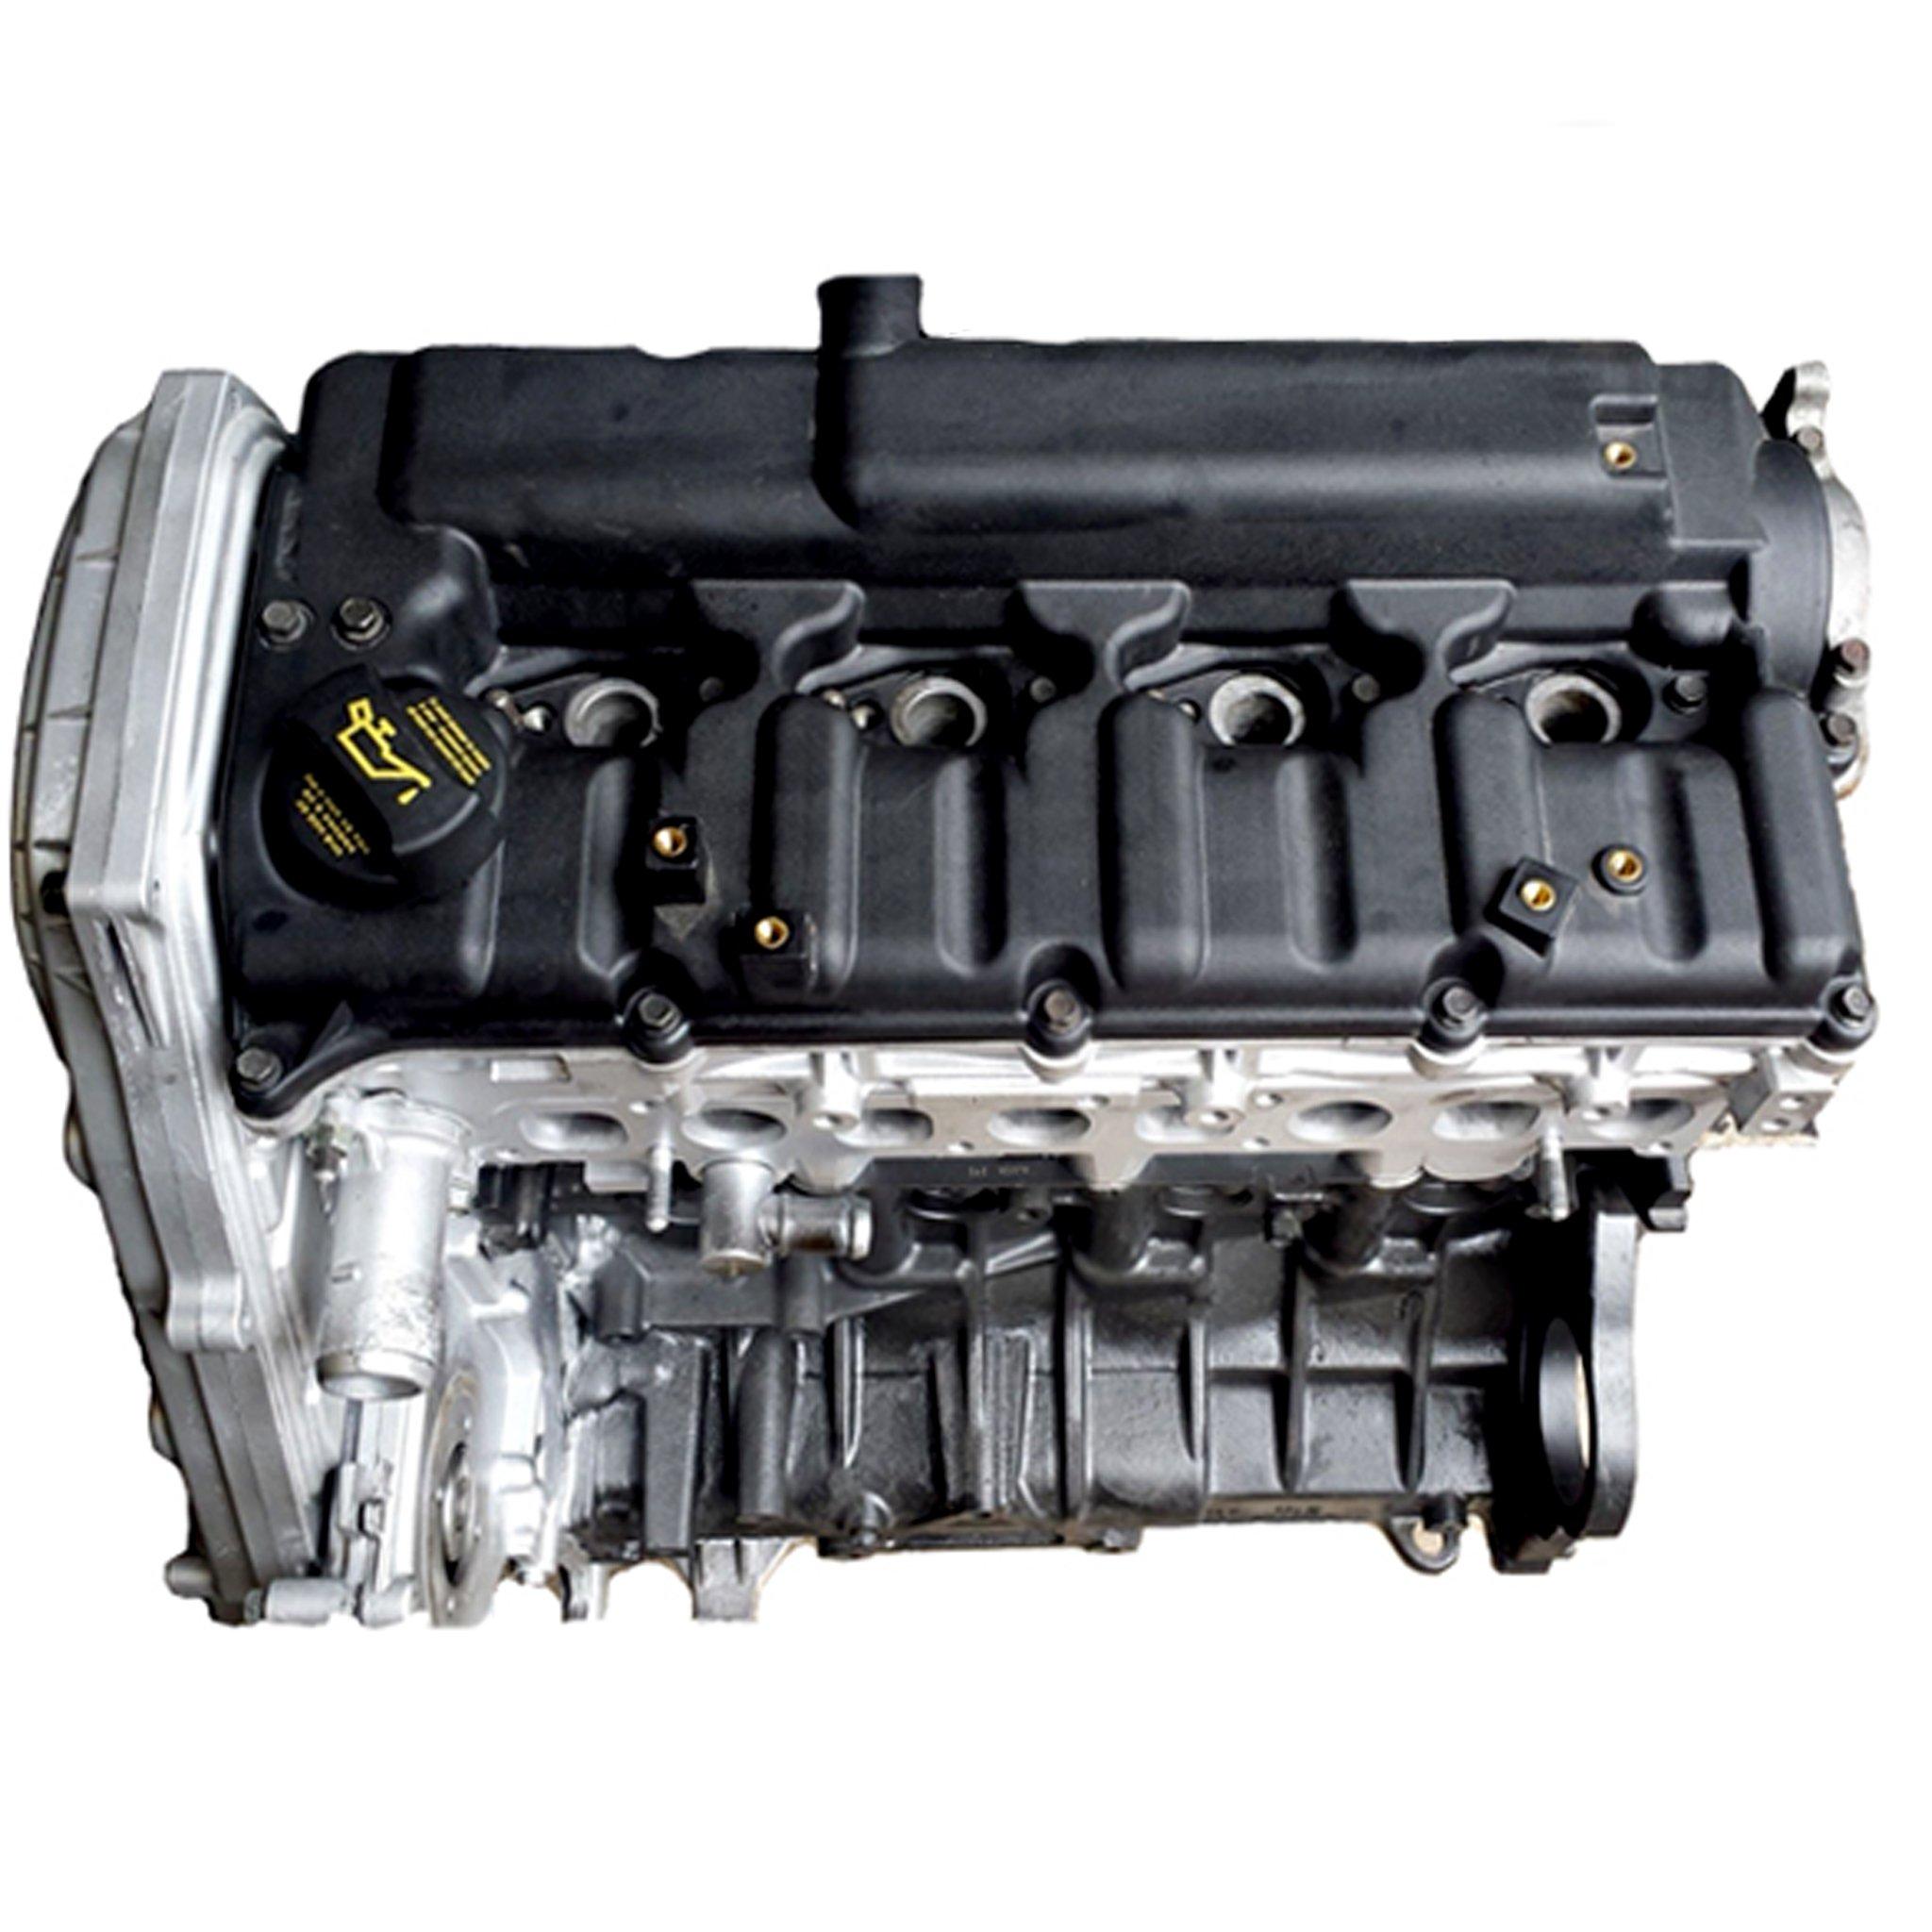 kia sorento hyundai h1 25 crdi двигатель d4cb 170 км